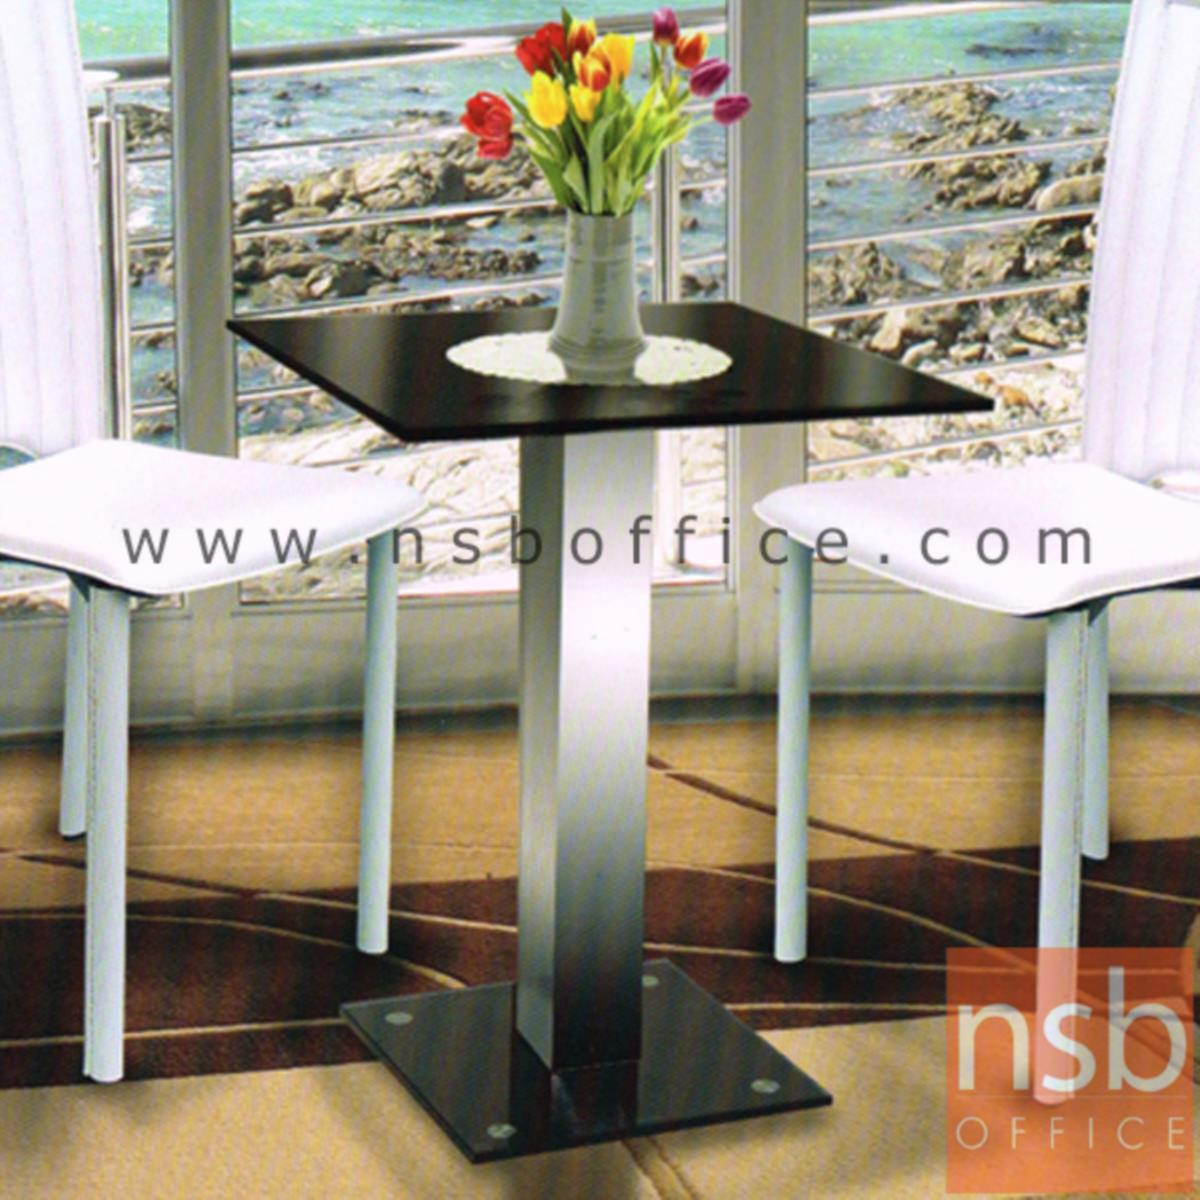 G14A089:โต๊ะเหลี่ยมหน้ากระจก รุ่น Knowles (โนวส์) ขนาด 60W cm.  โครงขาเหล็กชุบโครเมี่ยม